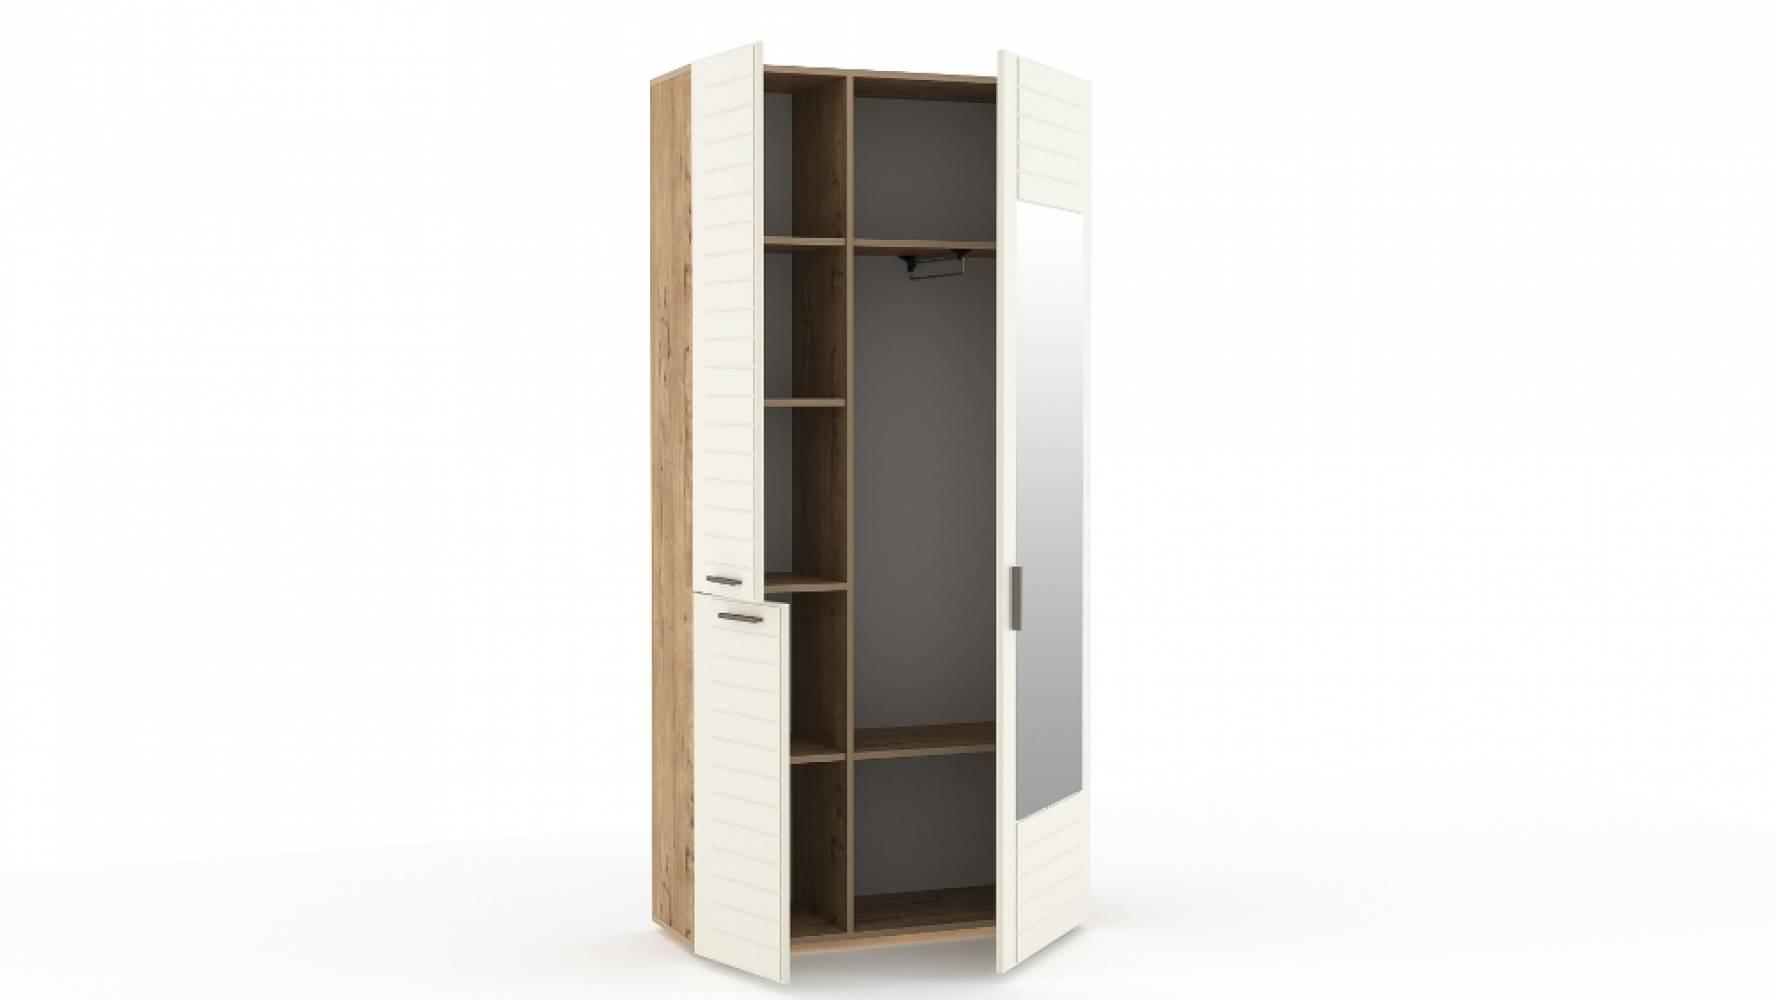 Шкаф для одежды с зеркалом НМ 013.36 LIVORNO (Дуб Бунратти/Софт Панакота)